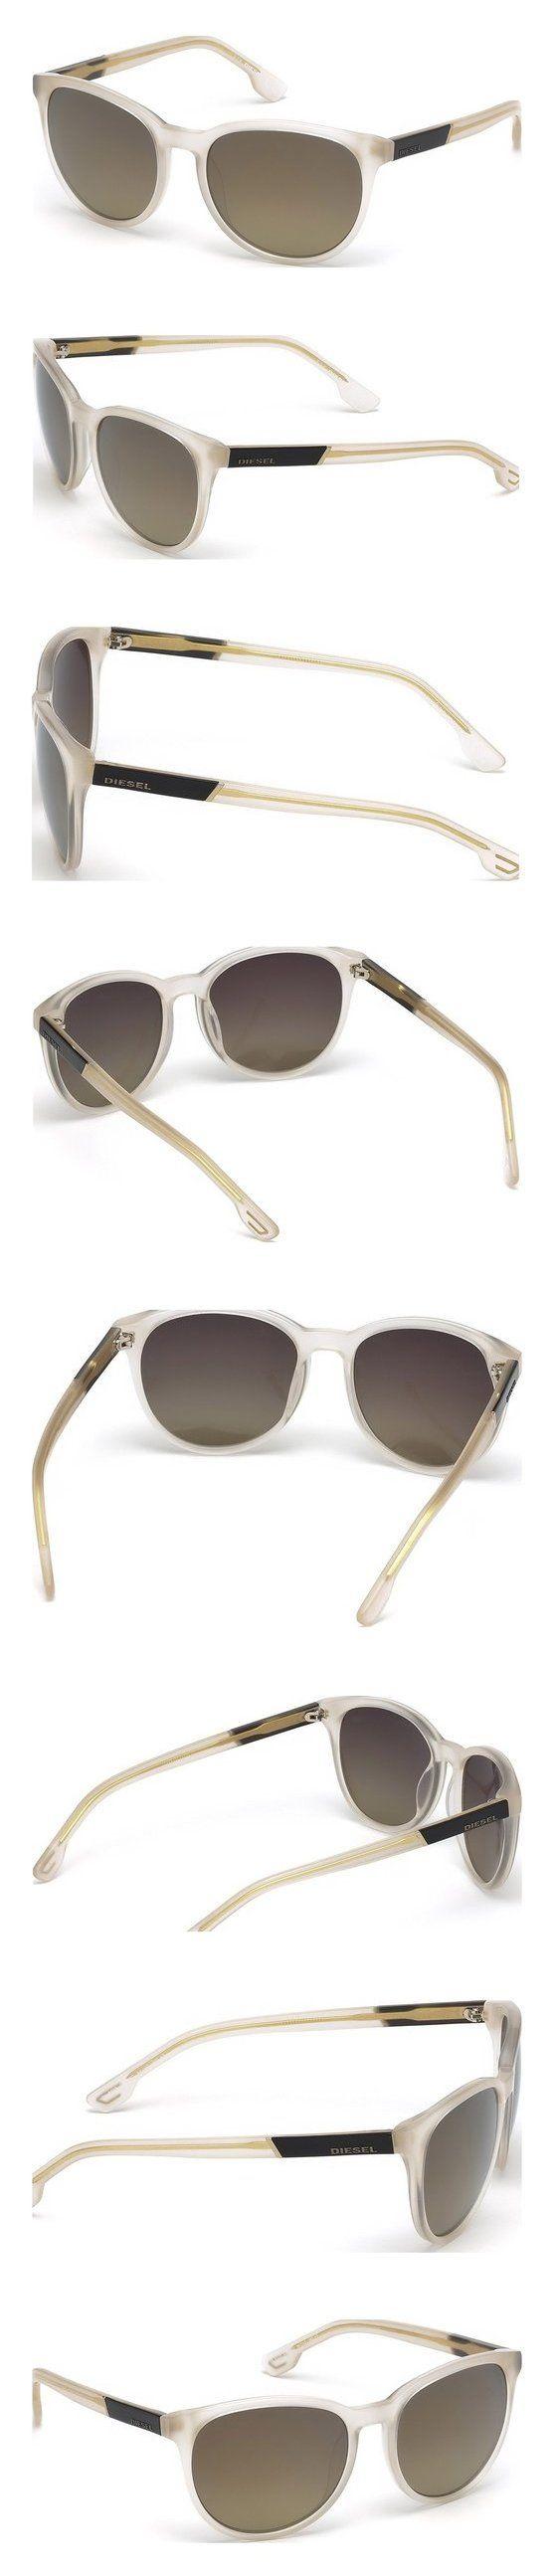 $135 - DIESEL Sunglasses DL0123 21G White / Brown Mirror 54MM #sunglasses #